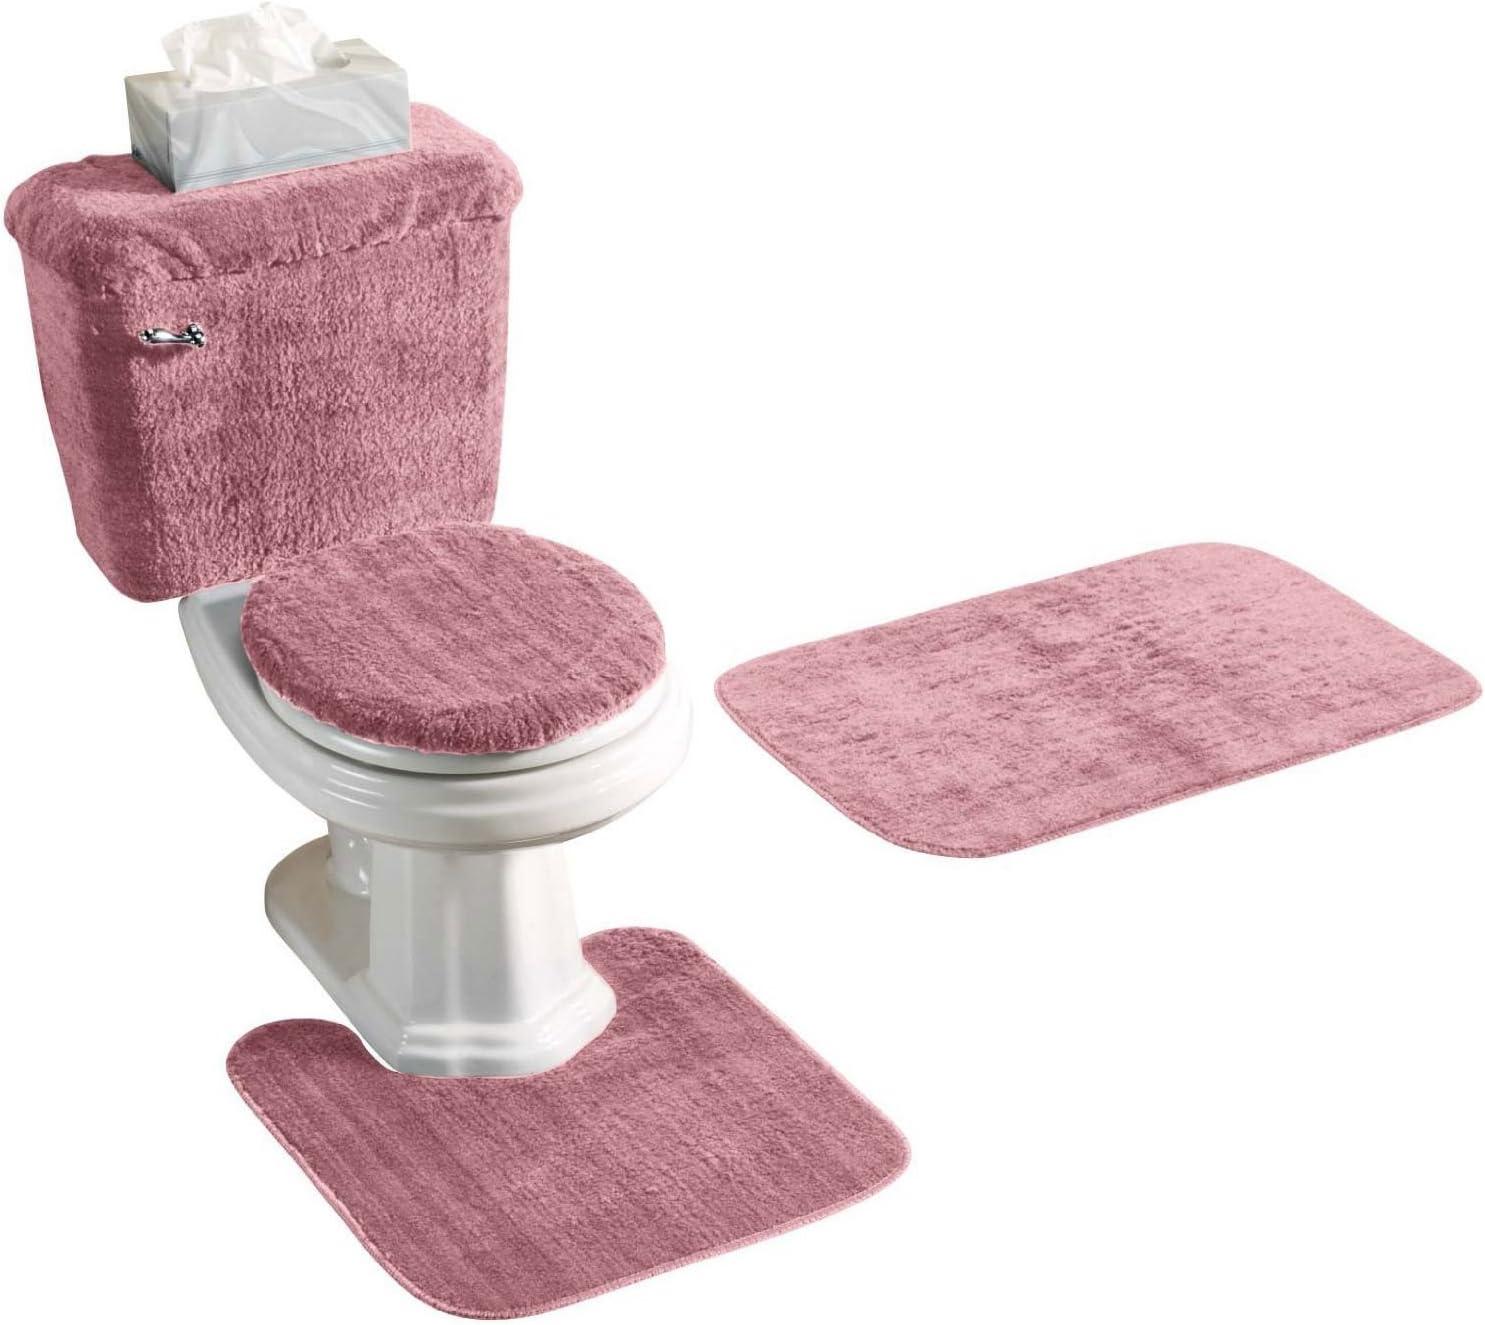 Amazon Com 5 Piece Rose Pink Bathroom Rug Set Includes Area Rug Contour Rug Lid Cover And Tank Set Color Rose Pink Home Kitchen